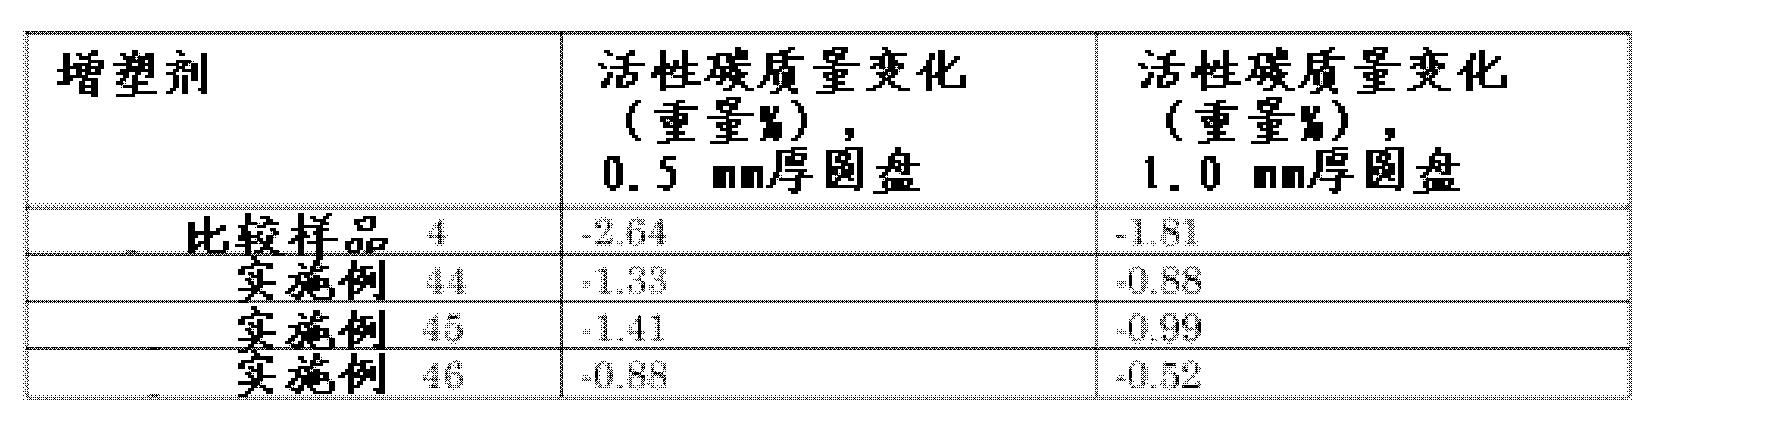 Figure CN102459219AD00341